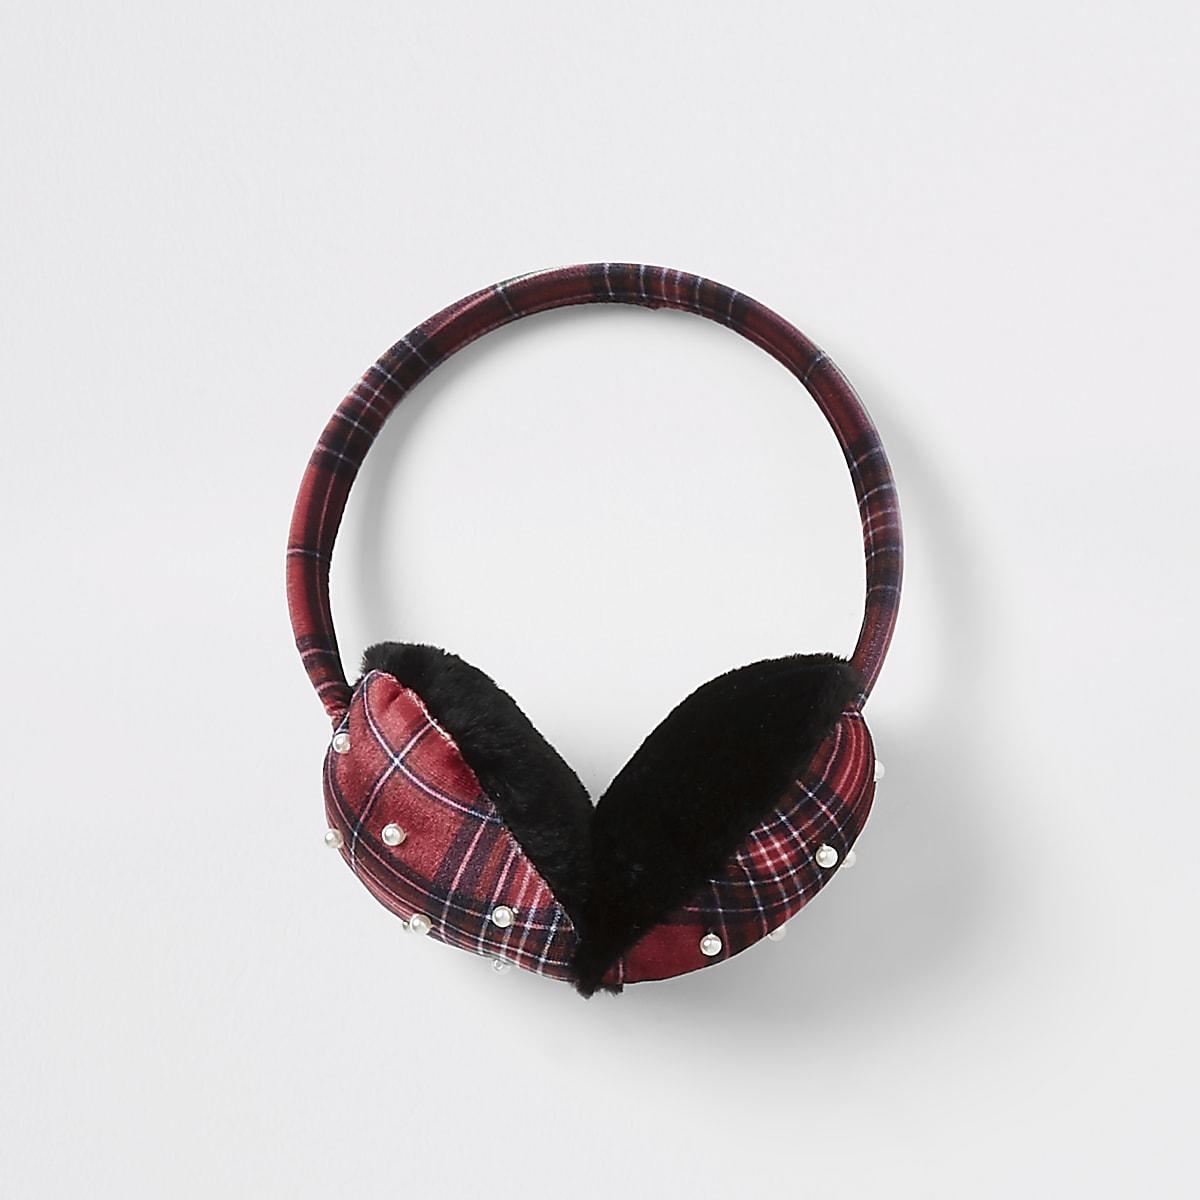 Rode geruite hartvormige oorwarmers met parels voor meisjes